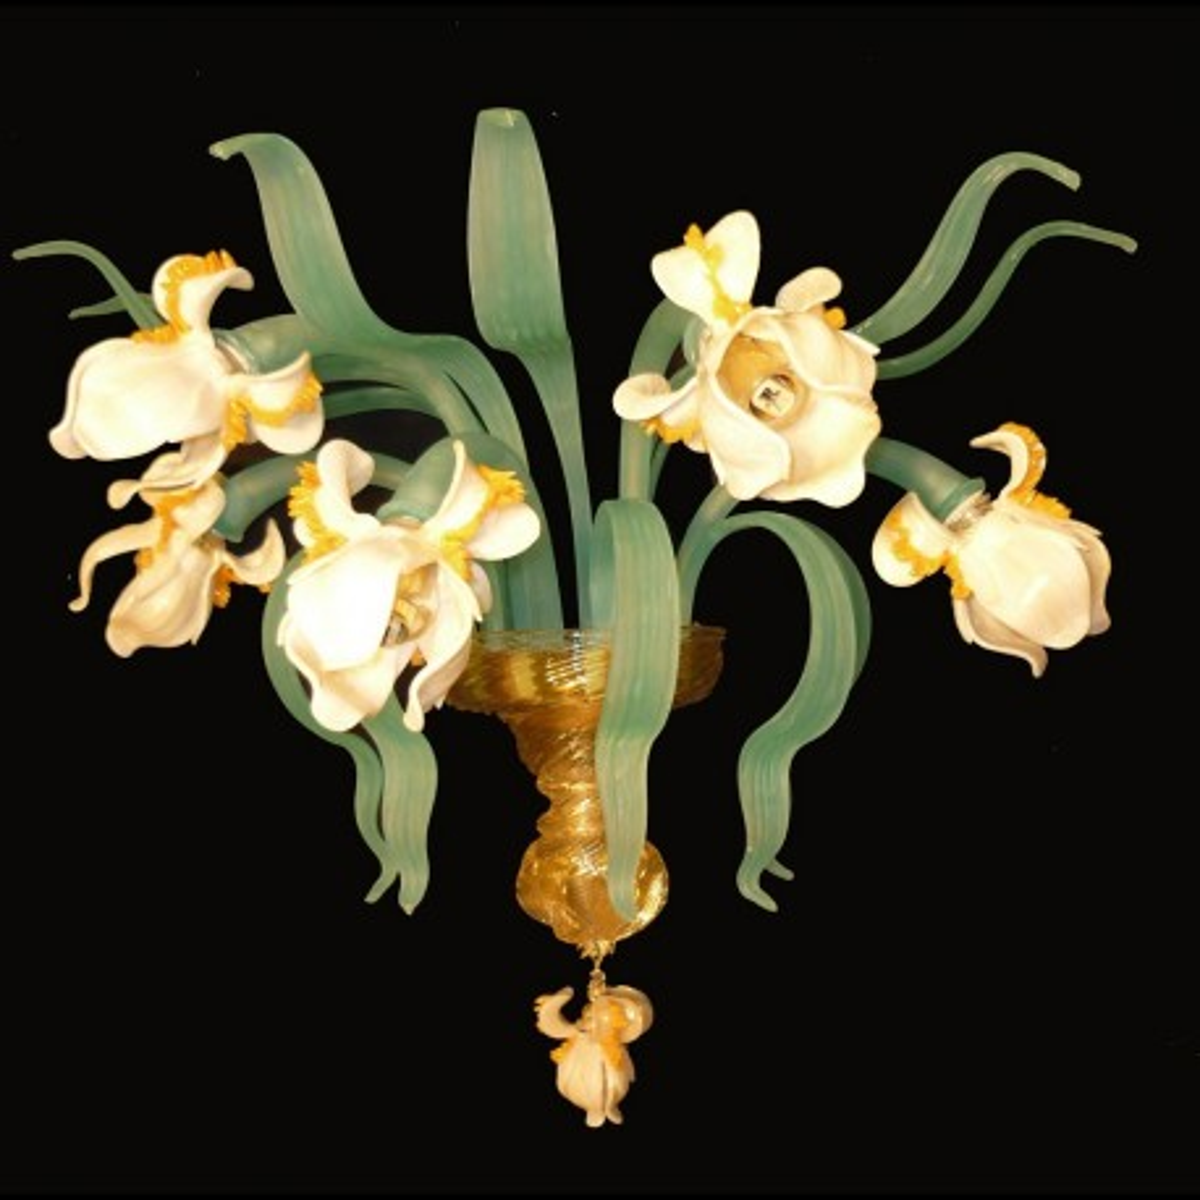 """Iris bianco"" 5 lumières applique en verre de Murano"